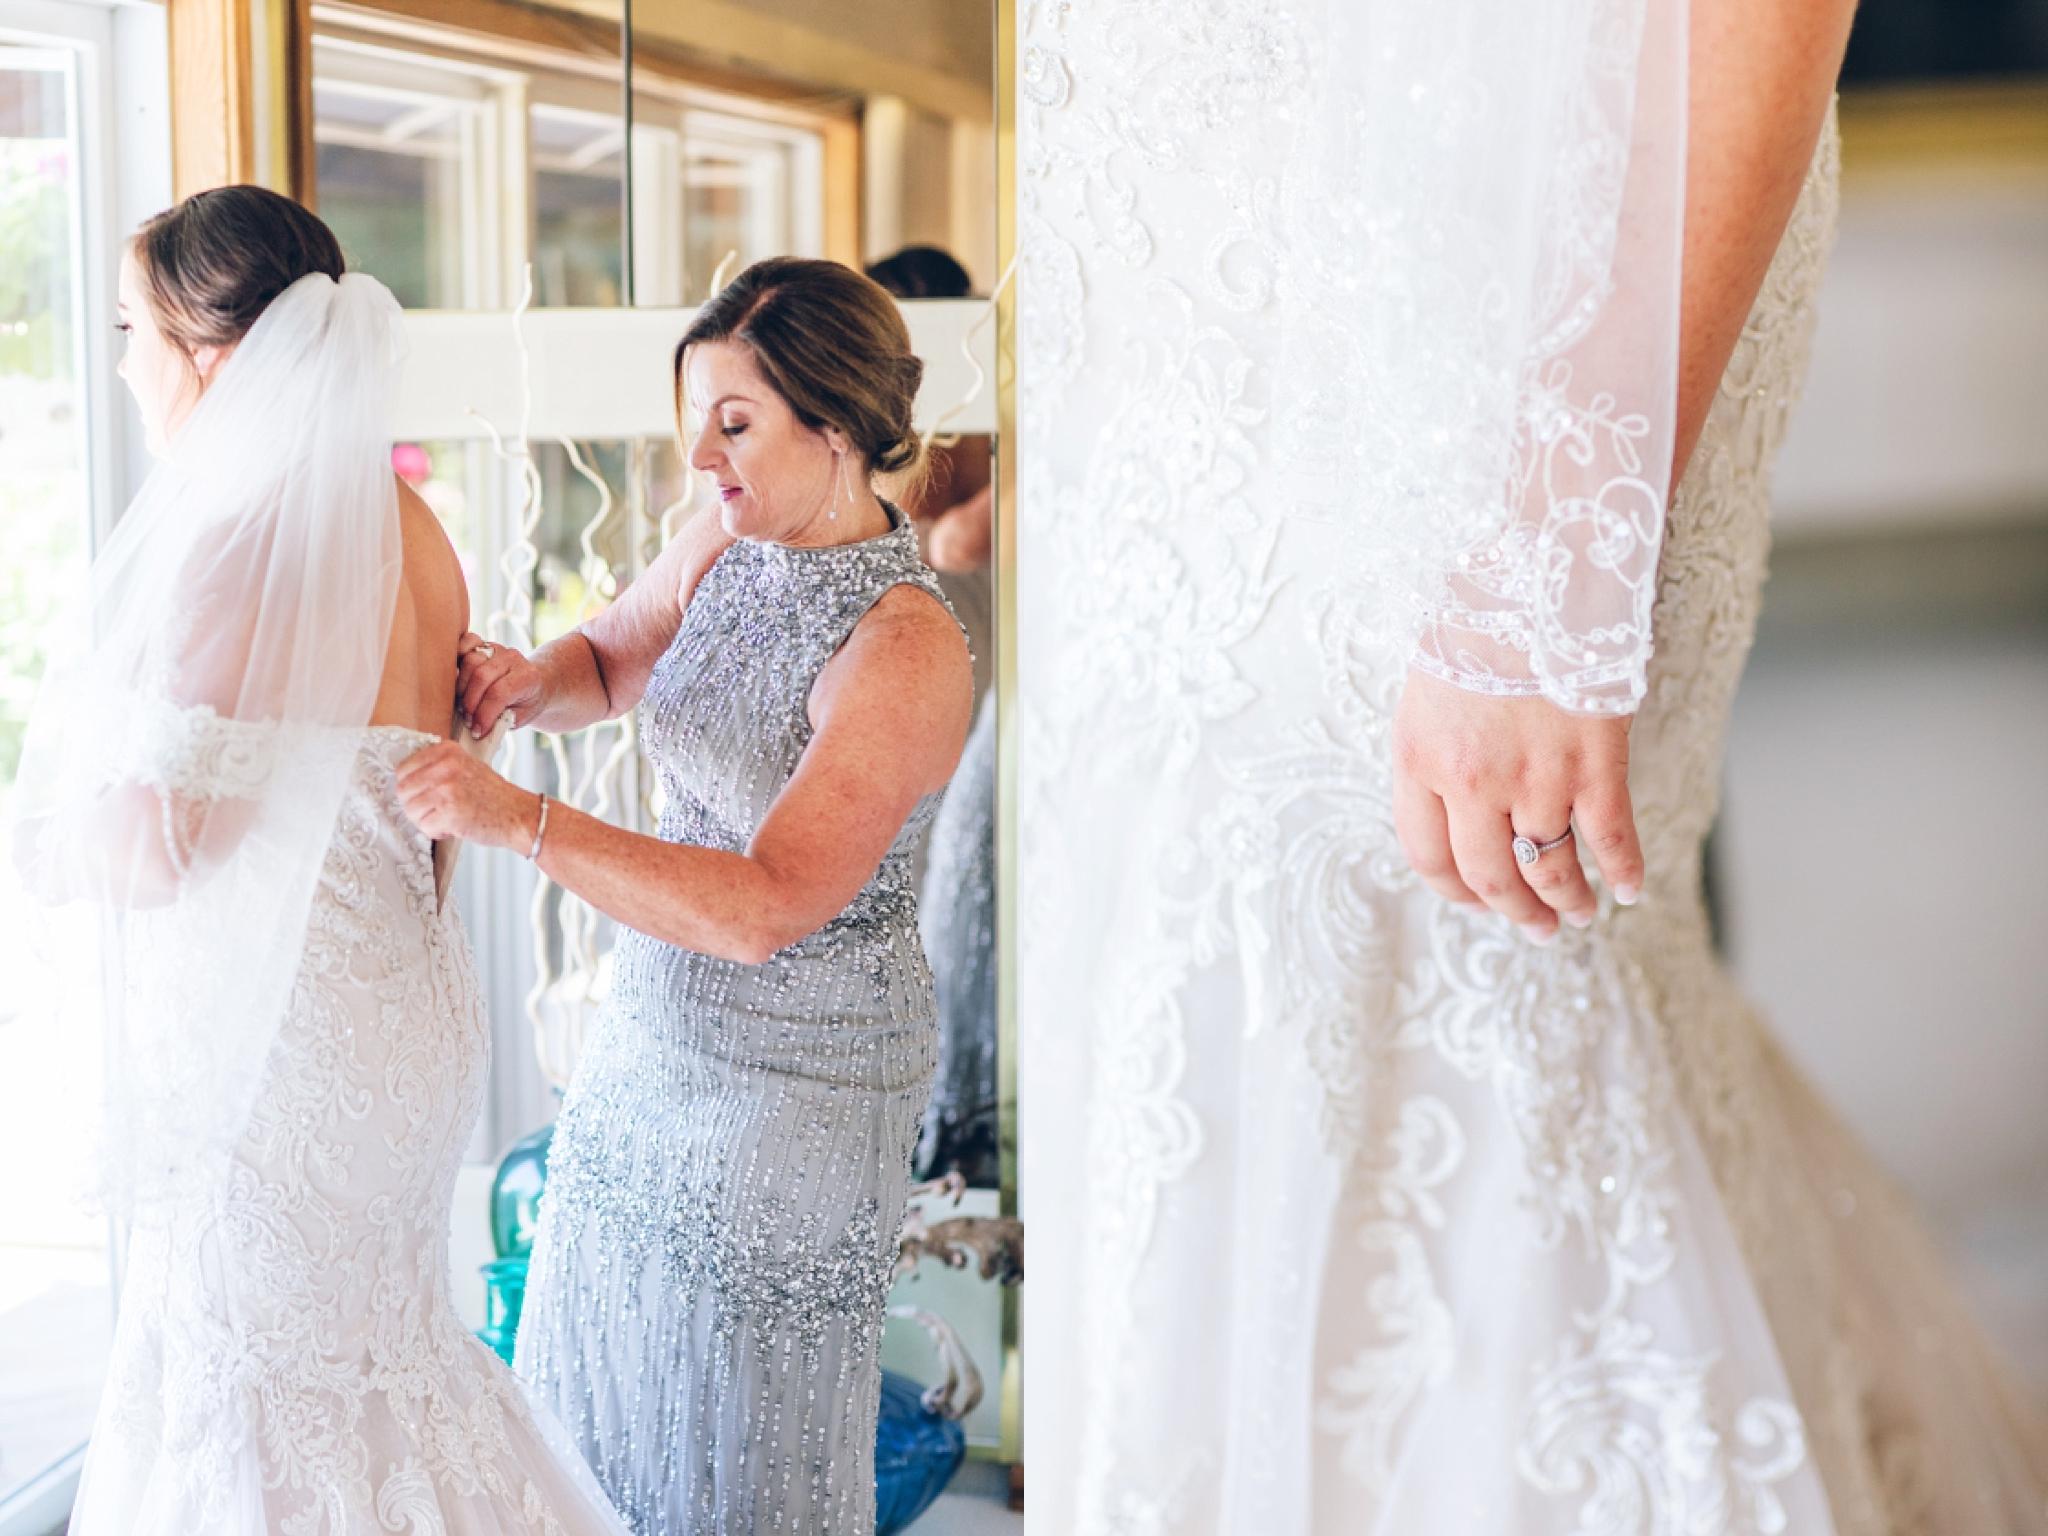 baker-lofts-holland-michigan-wedding-photographer_0303.jpg